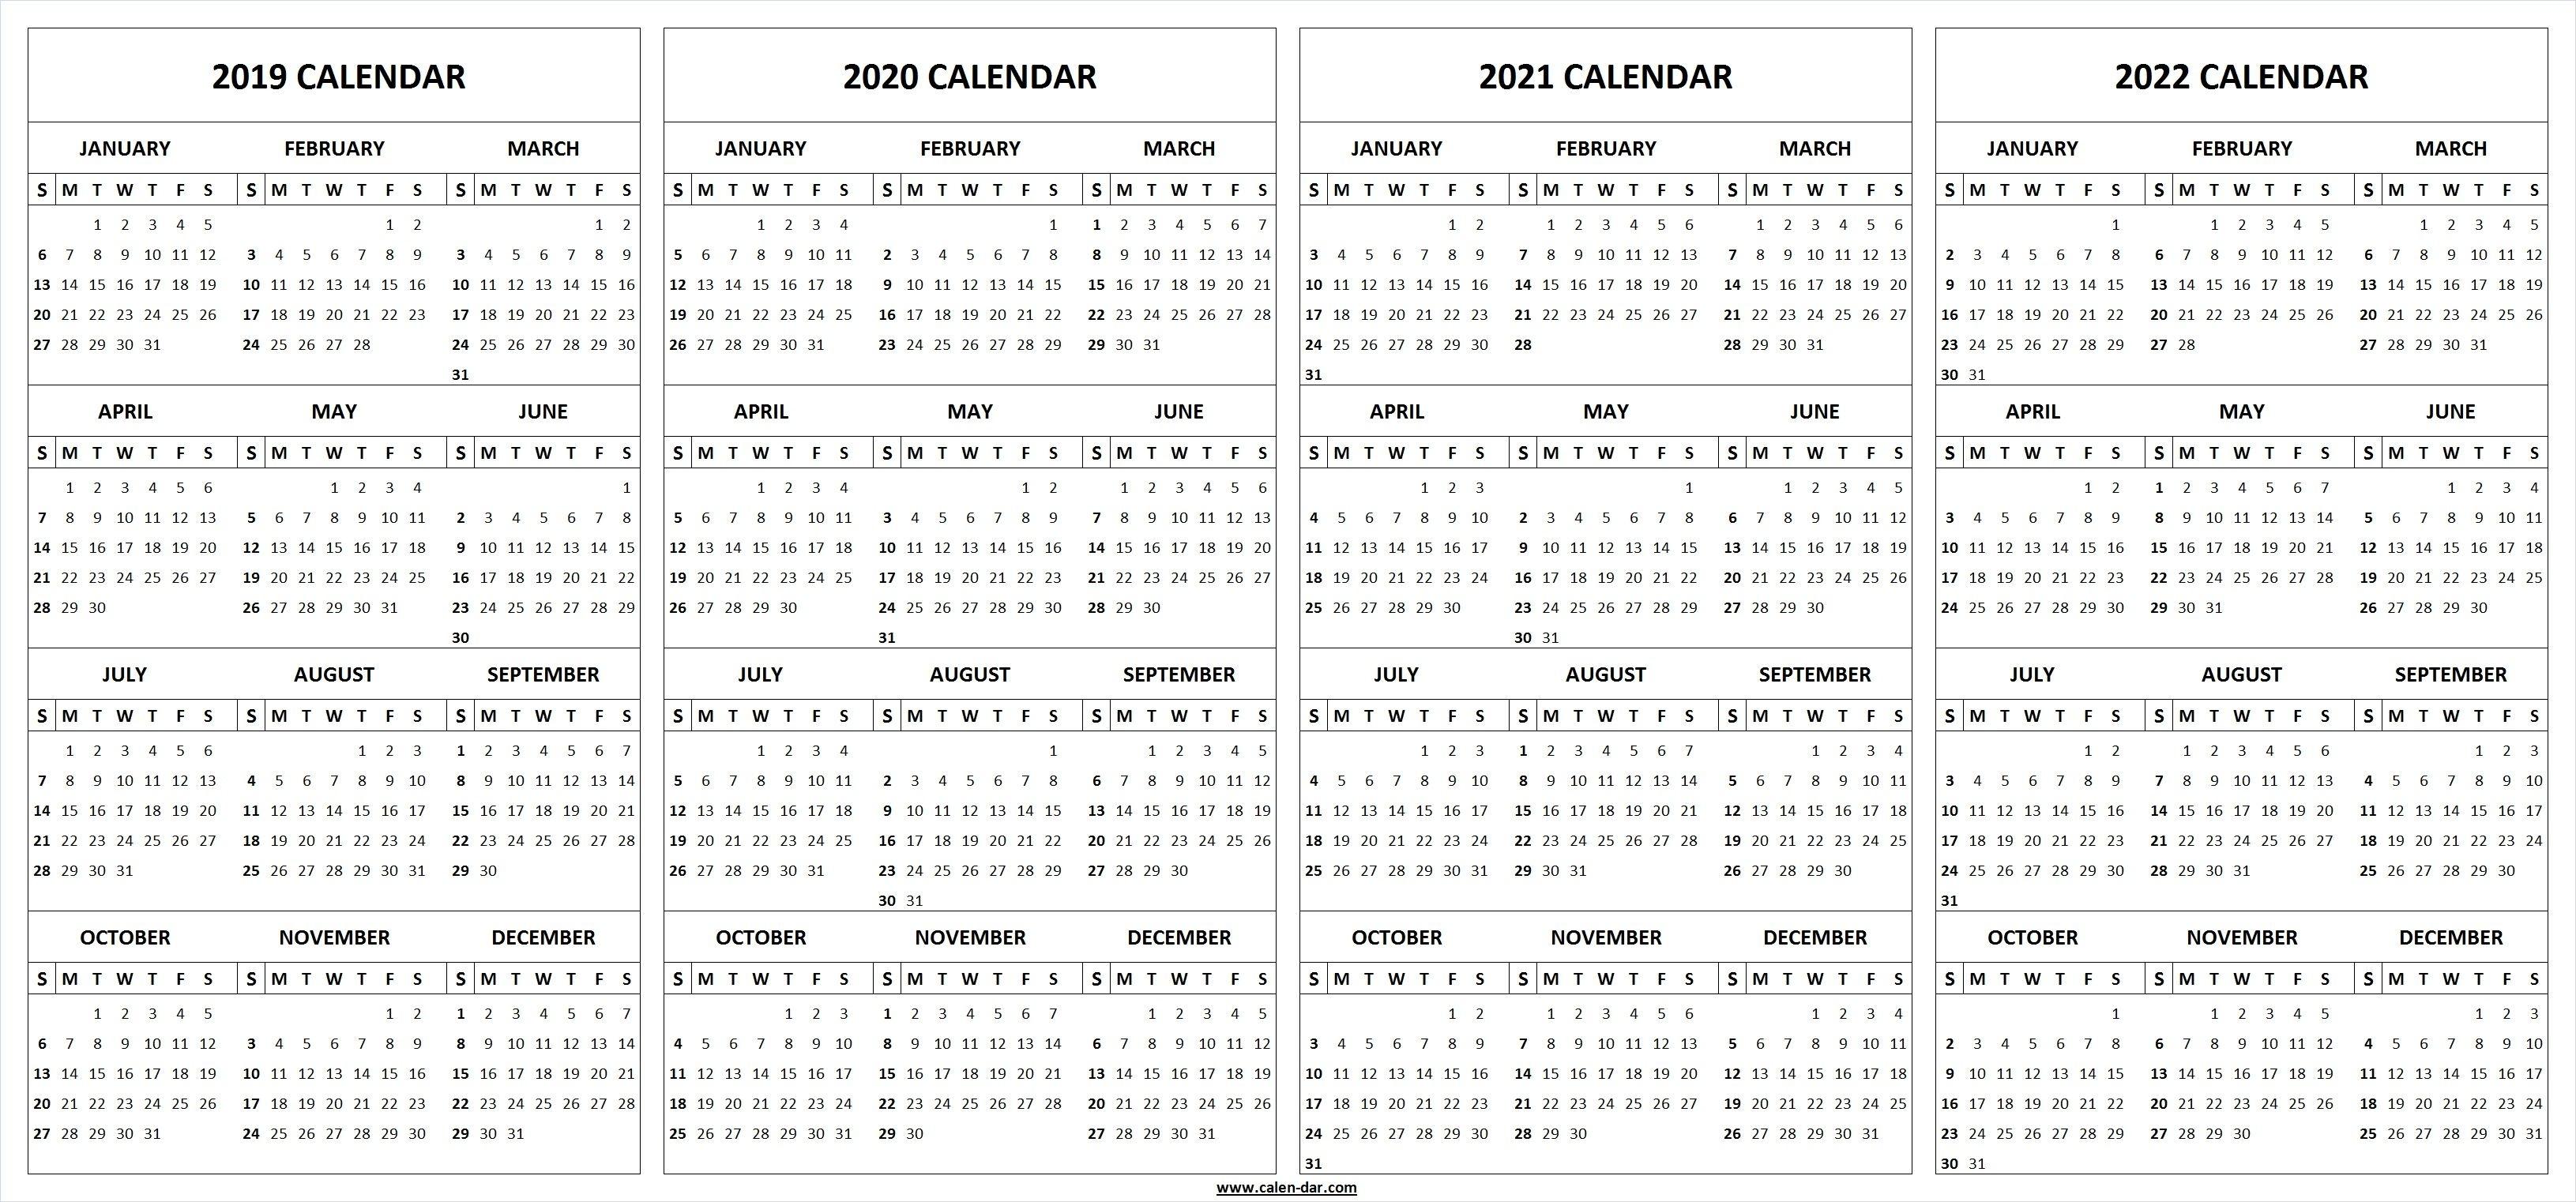 2019 2020 2021 2022 Calendar Blank Template | 2021 Calendar throughout 2019 2020 2021 Printable Calendar